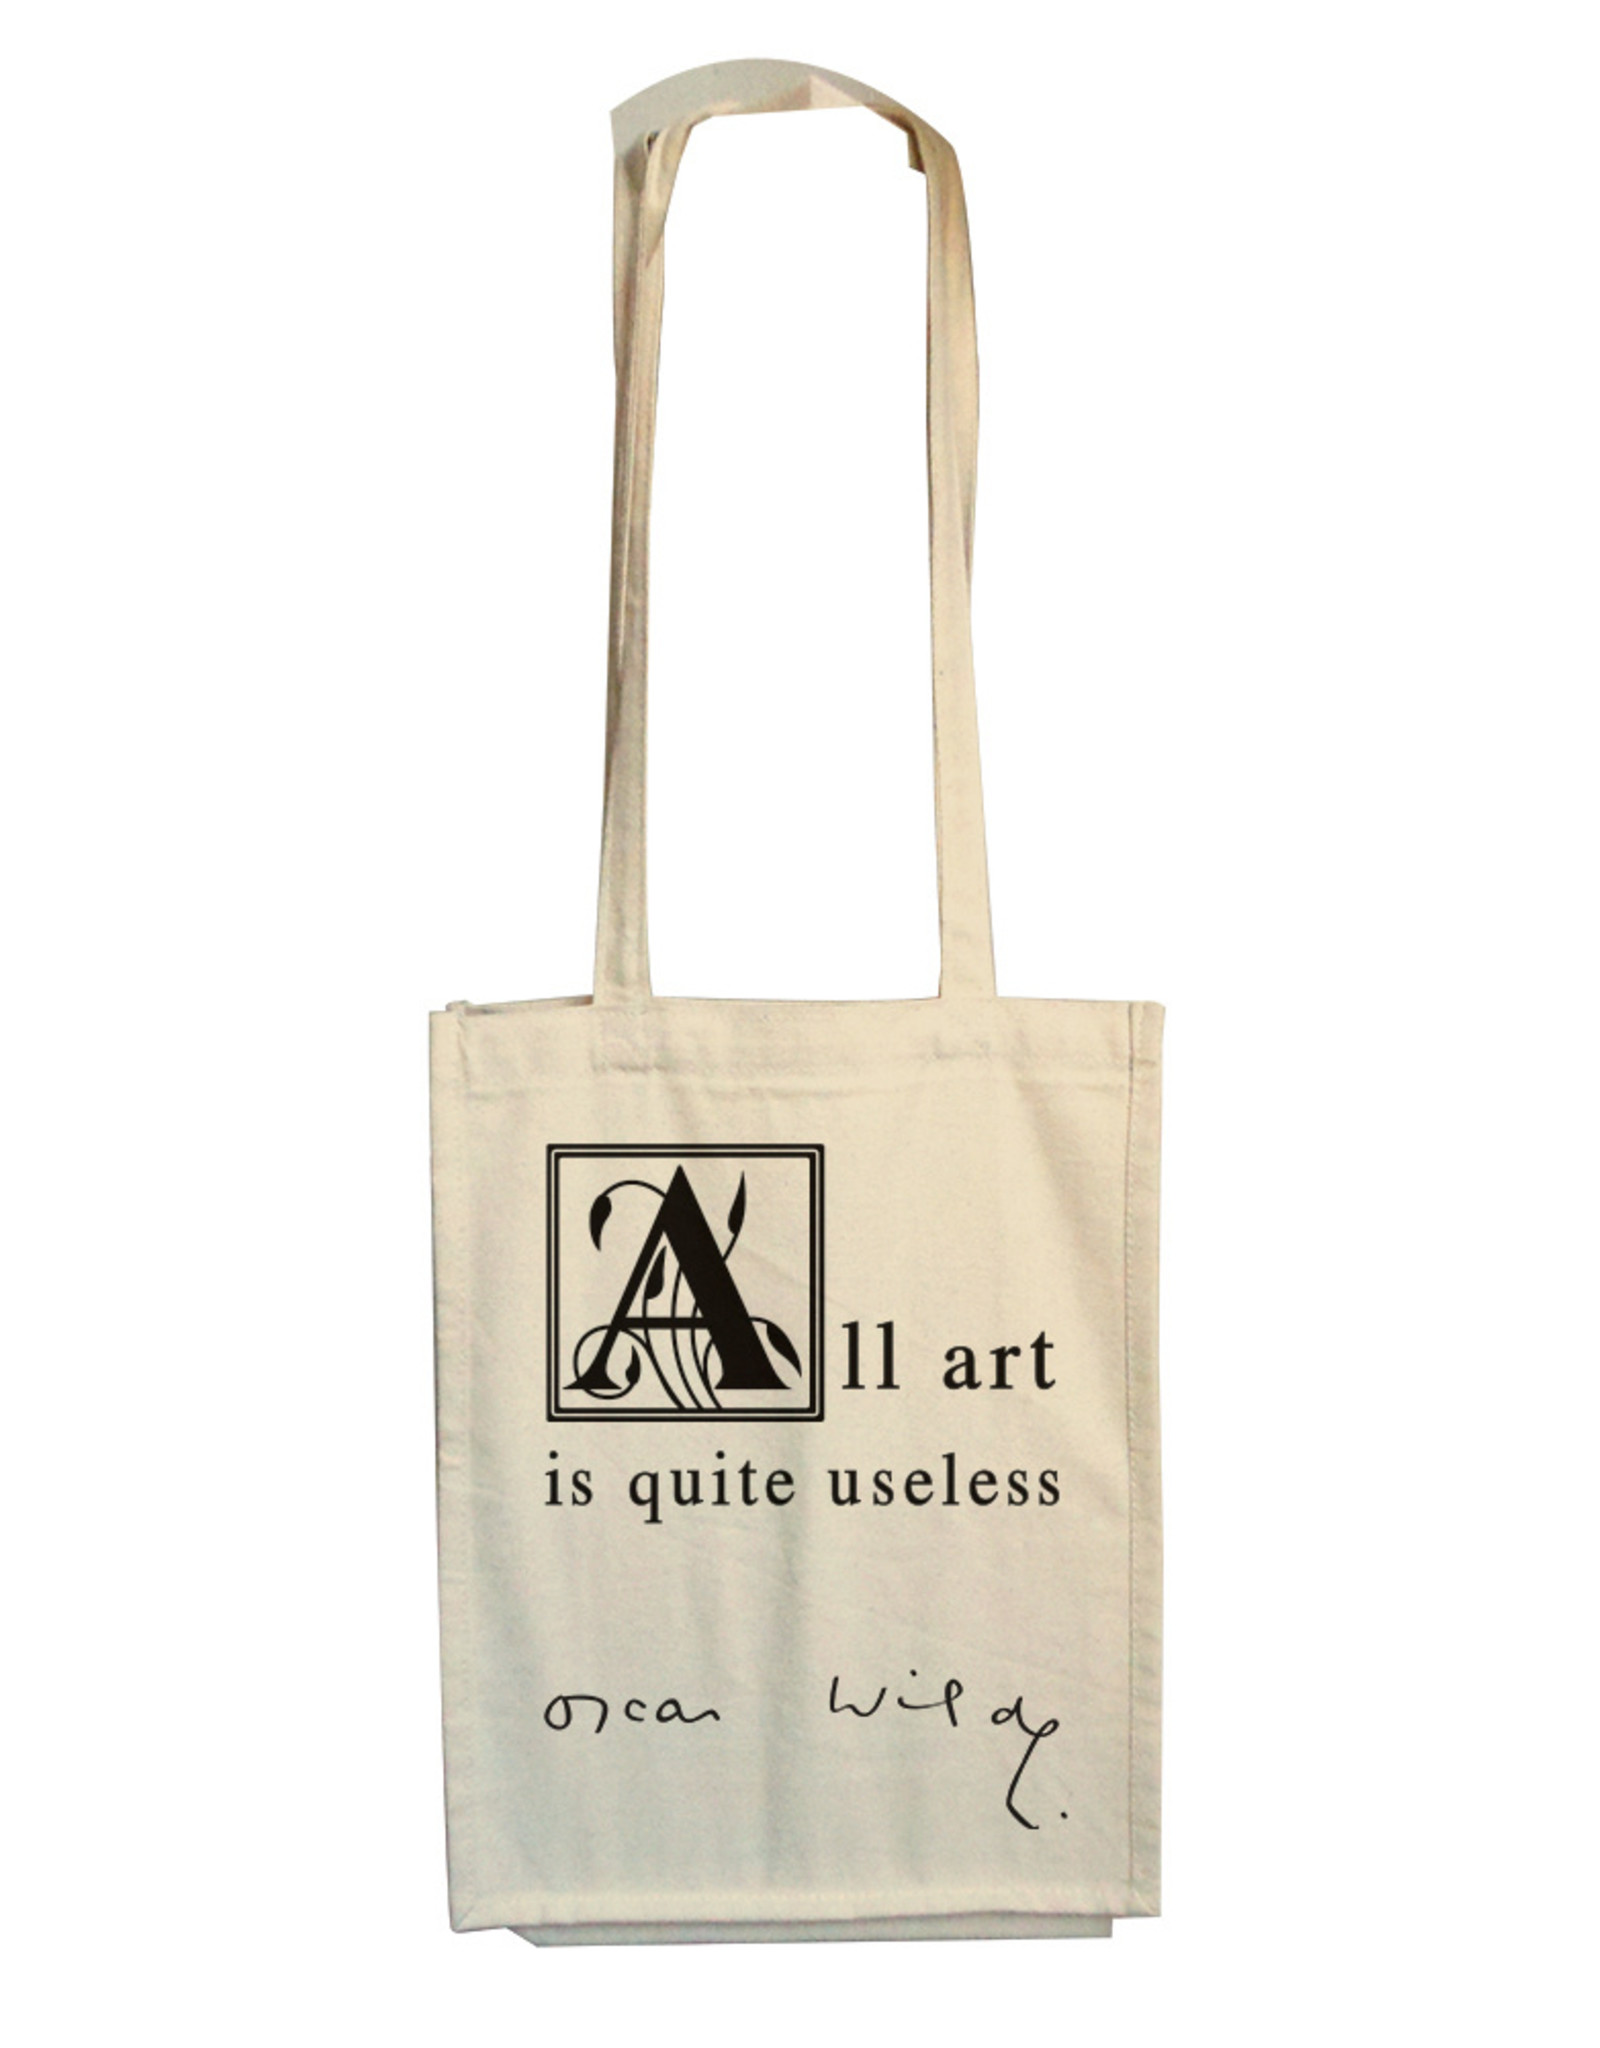 Oscar Wilde - All Art is quite useless-Tas